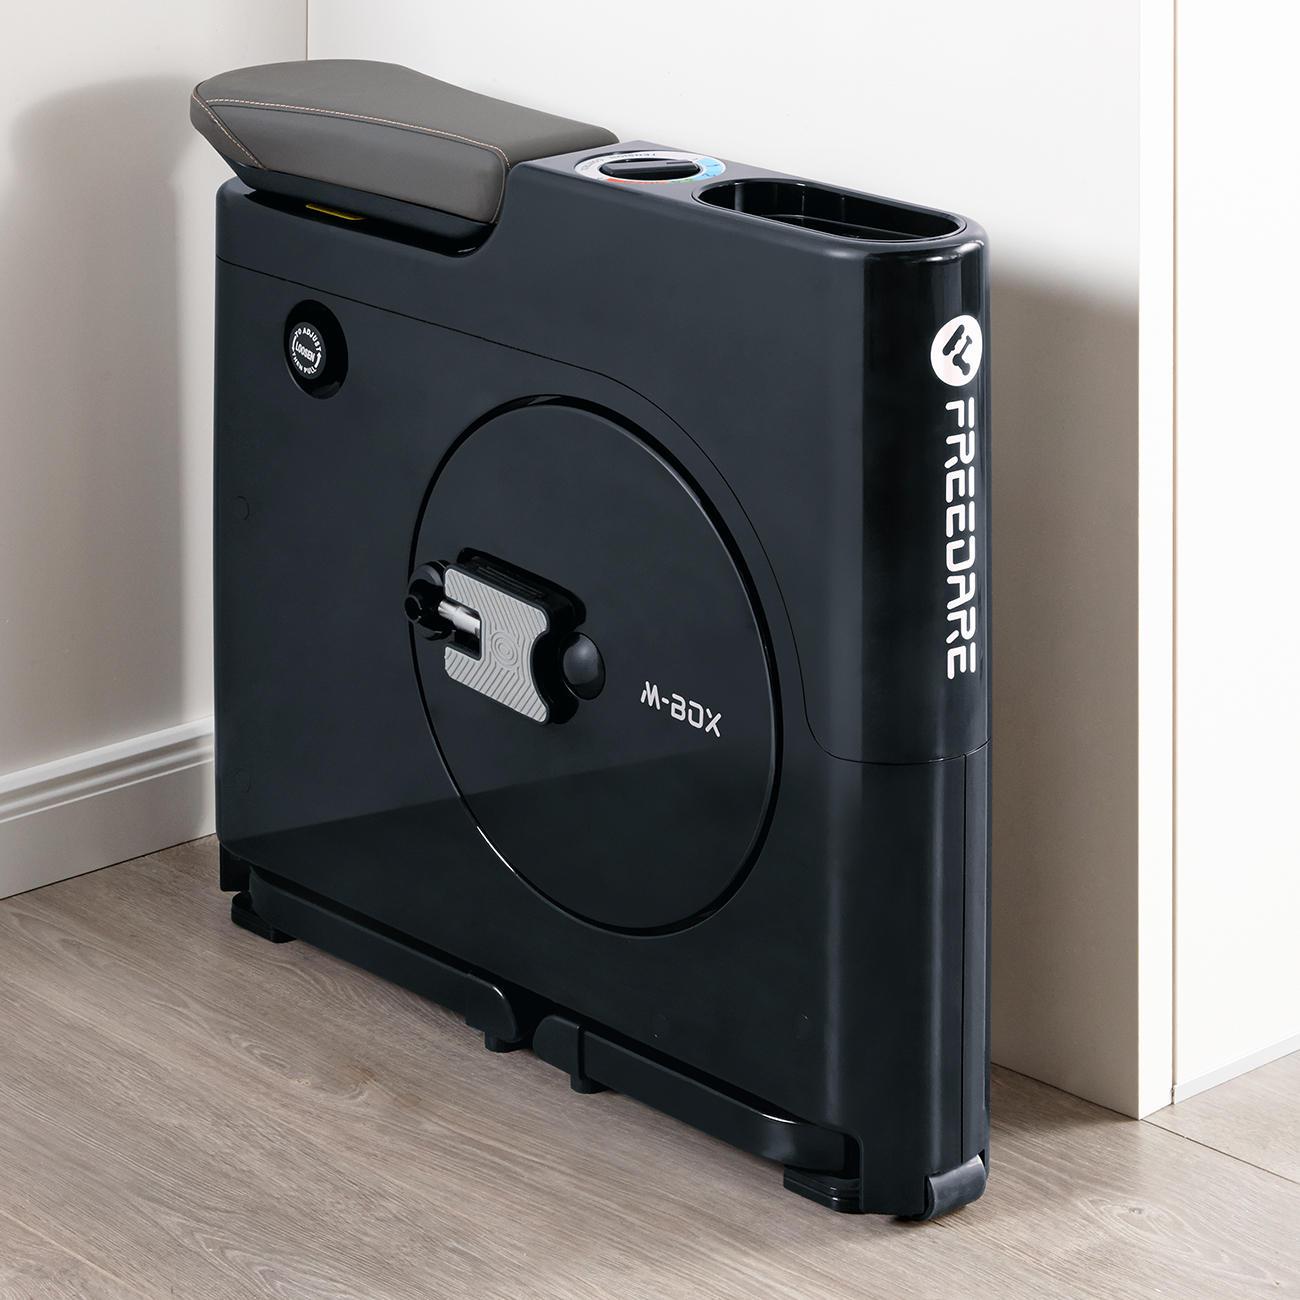 flachdesign hometrainer 3 jahre garantie pro idee. Black Bedroom Furniture Sets. Home Design Ideas